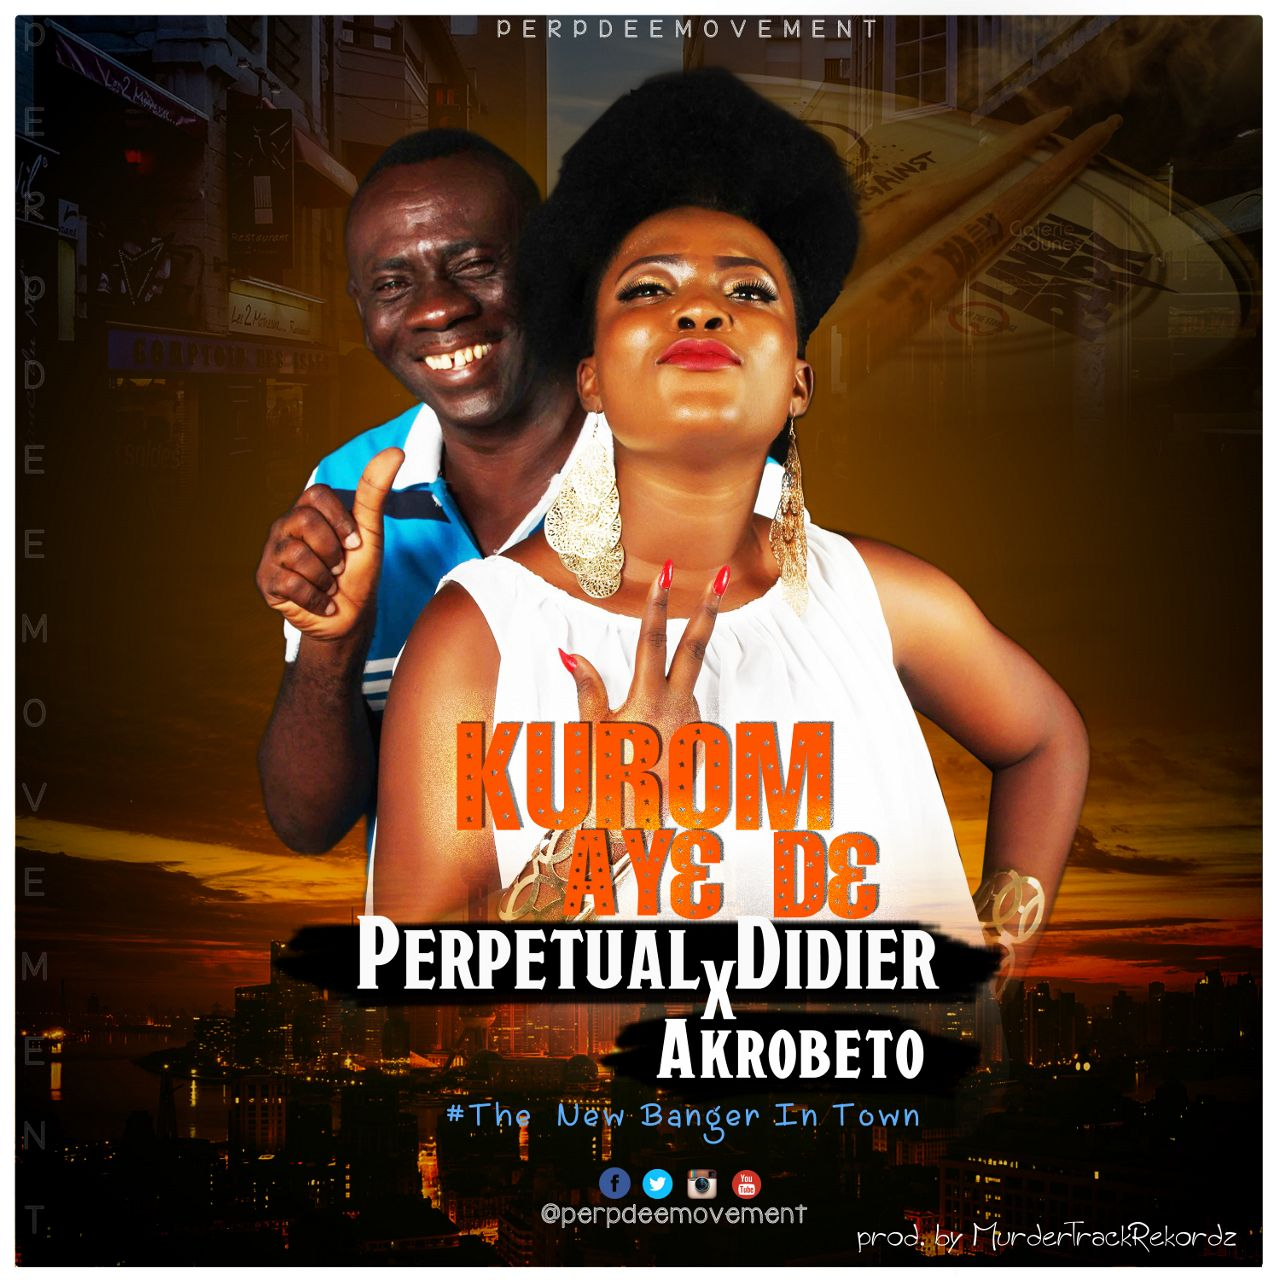 perpetual-didier-ft-akrobeto-kurom-ay3-d3-prod-by-murdertrack-recordz